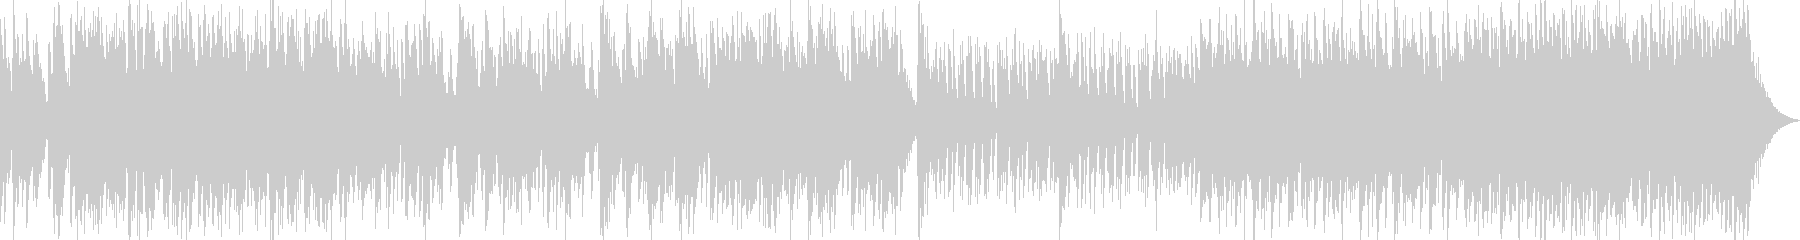 日本伝統音楽2(和太鼓)の未再生の波形